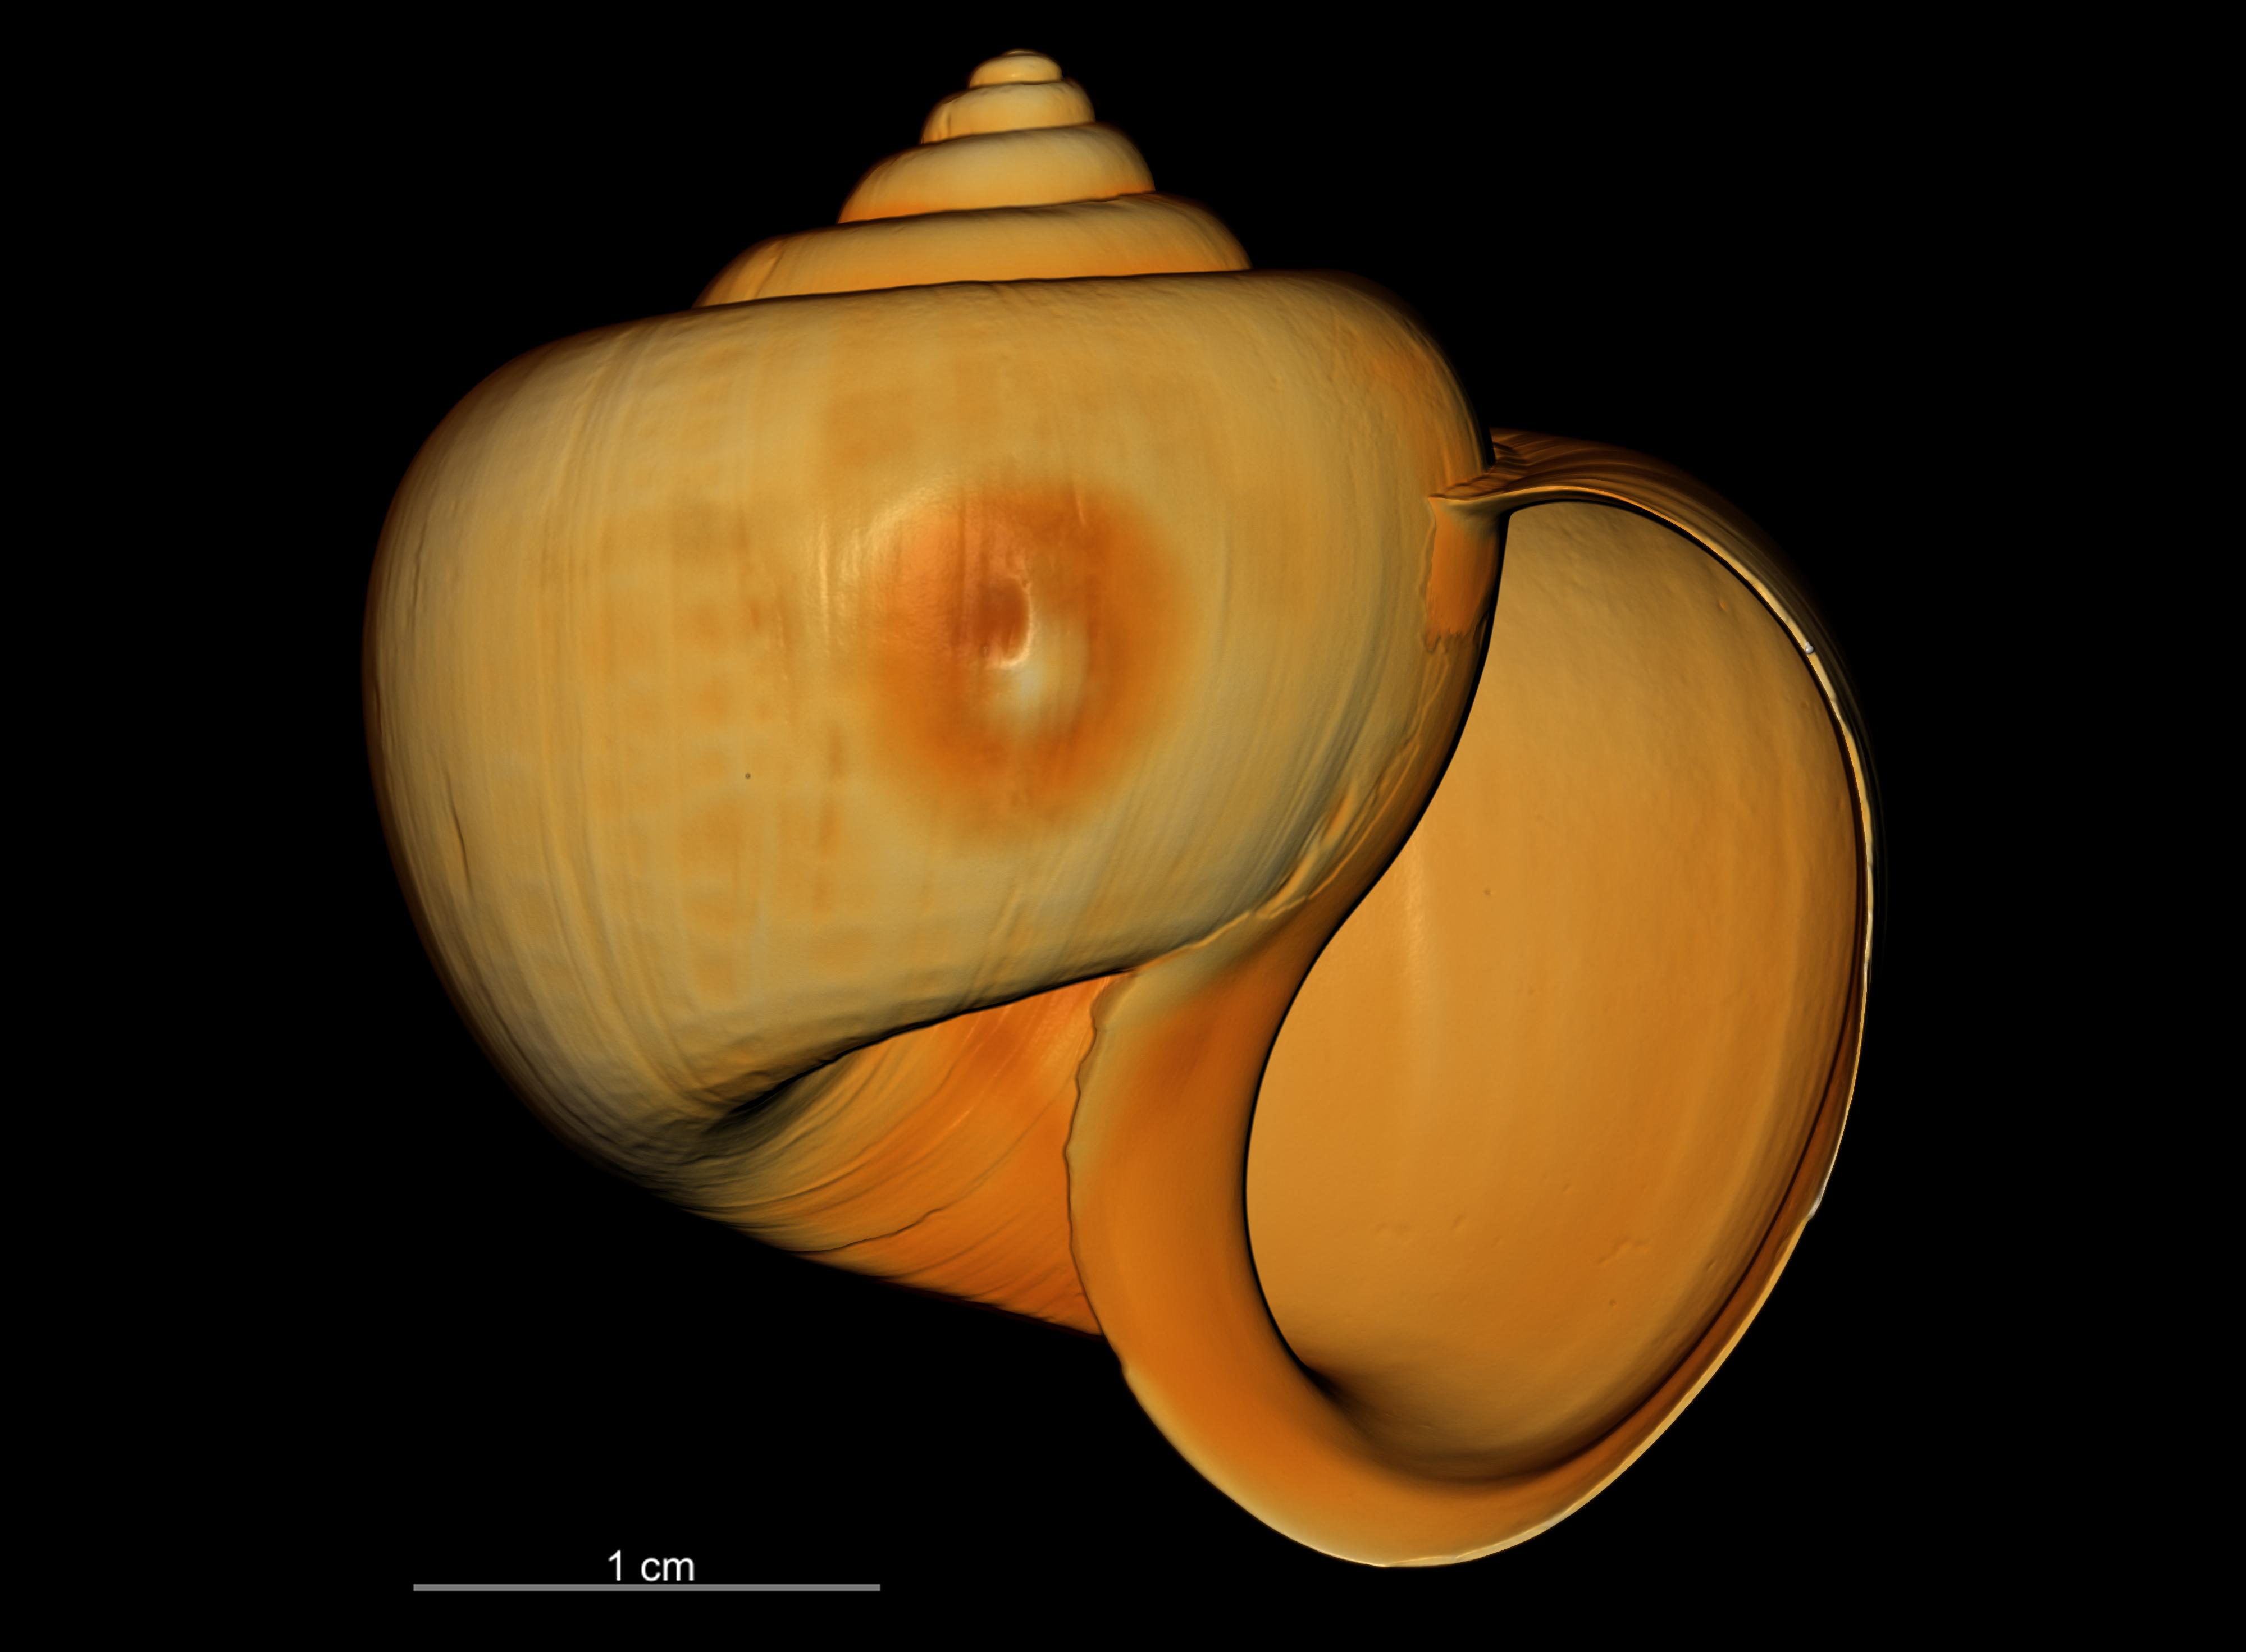 BE-RBINS-INV SYNTYPE MT.3849/1 Ampullaria puntaplaya bulk ORAL MCT RX.jpg